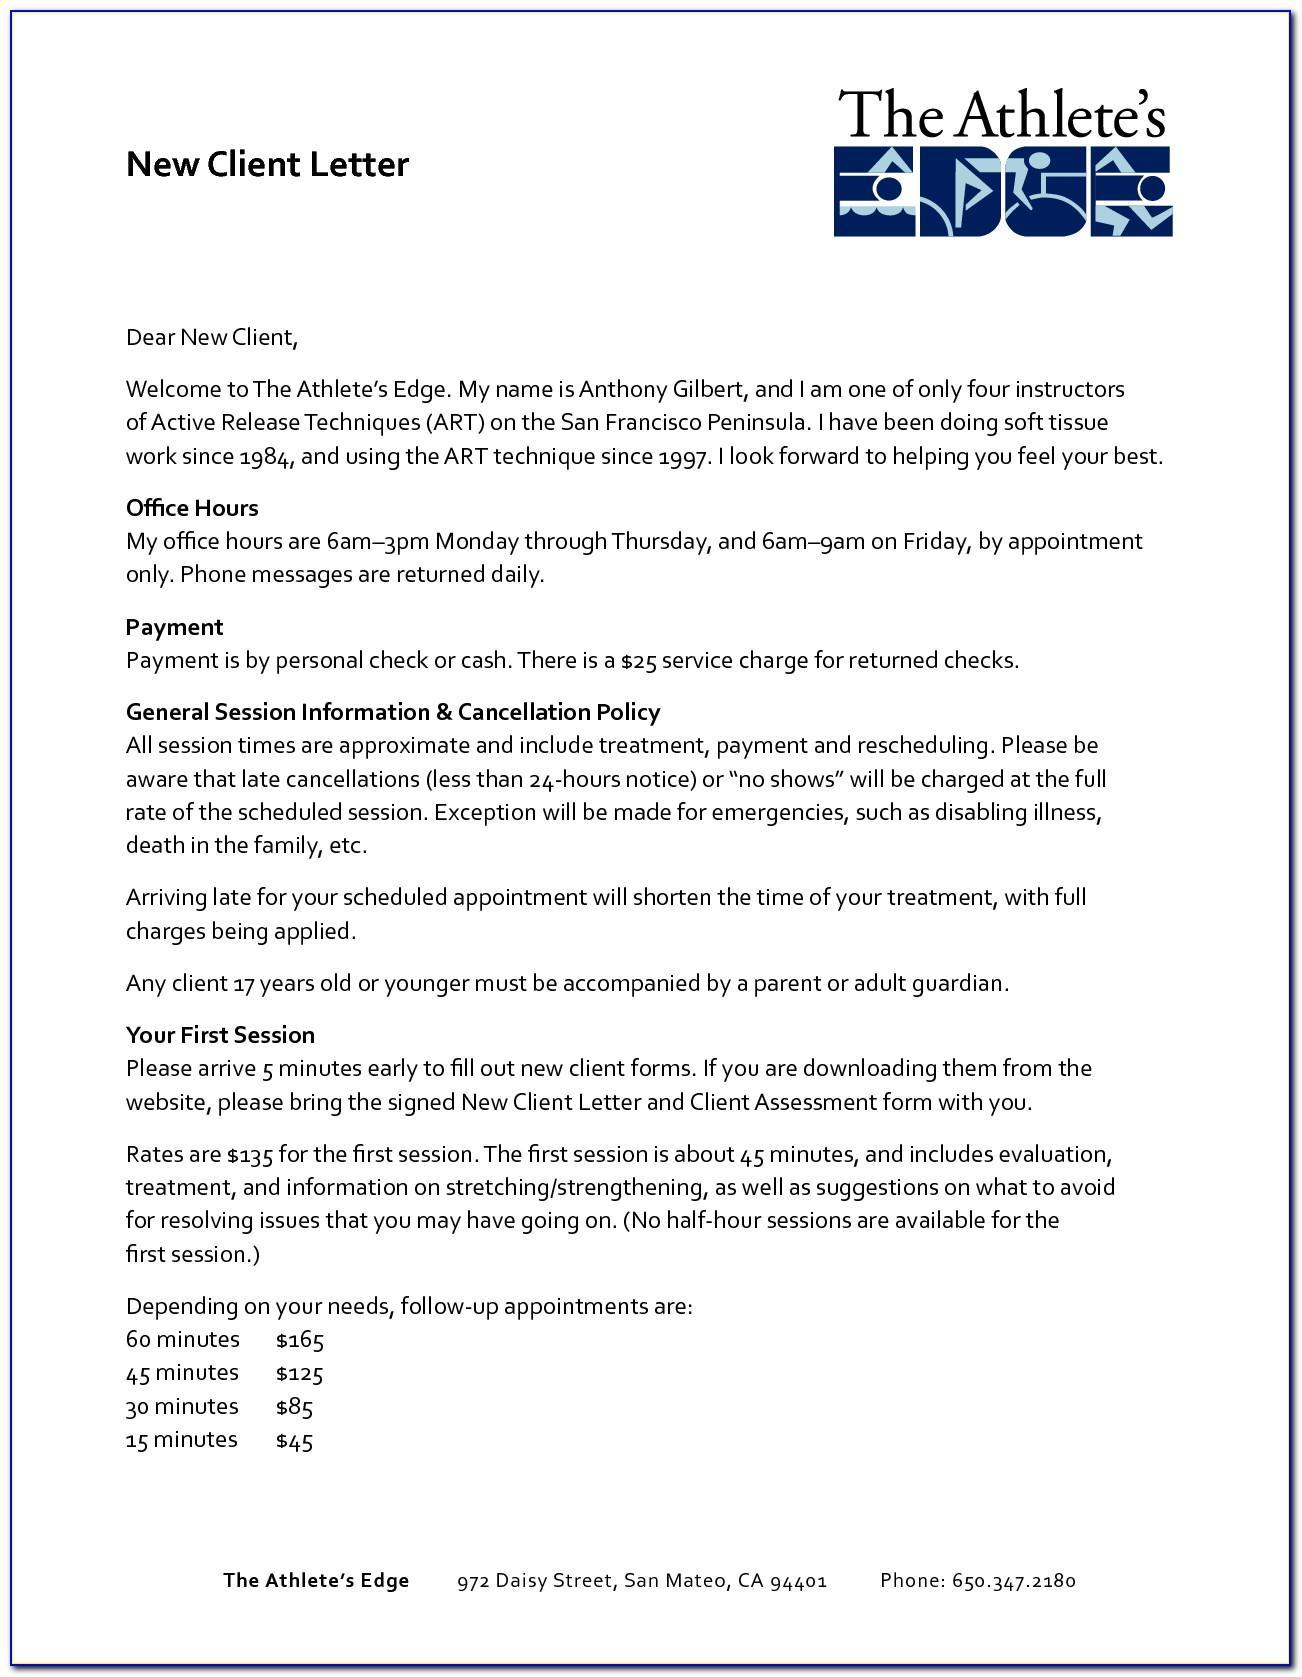 Welcome Letter Sample New Customer